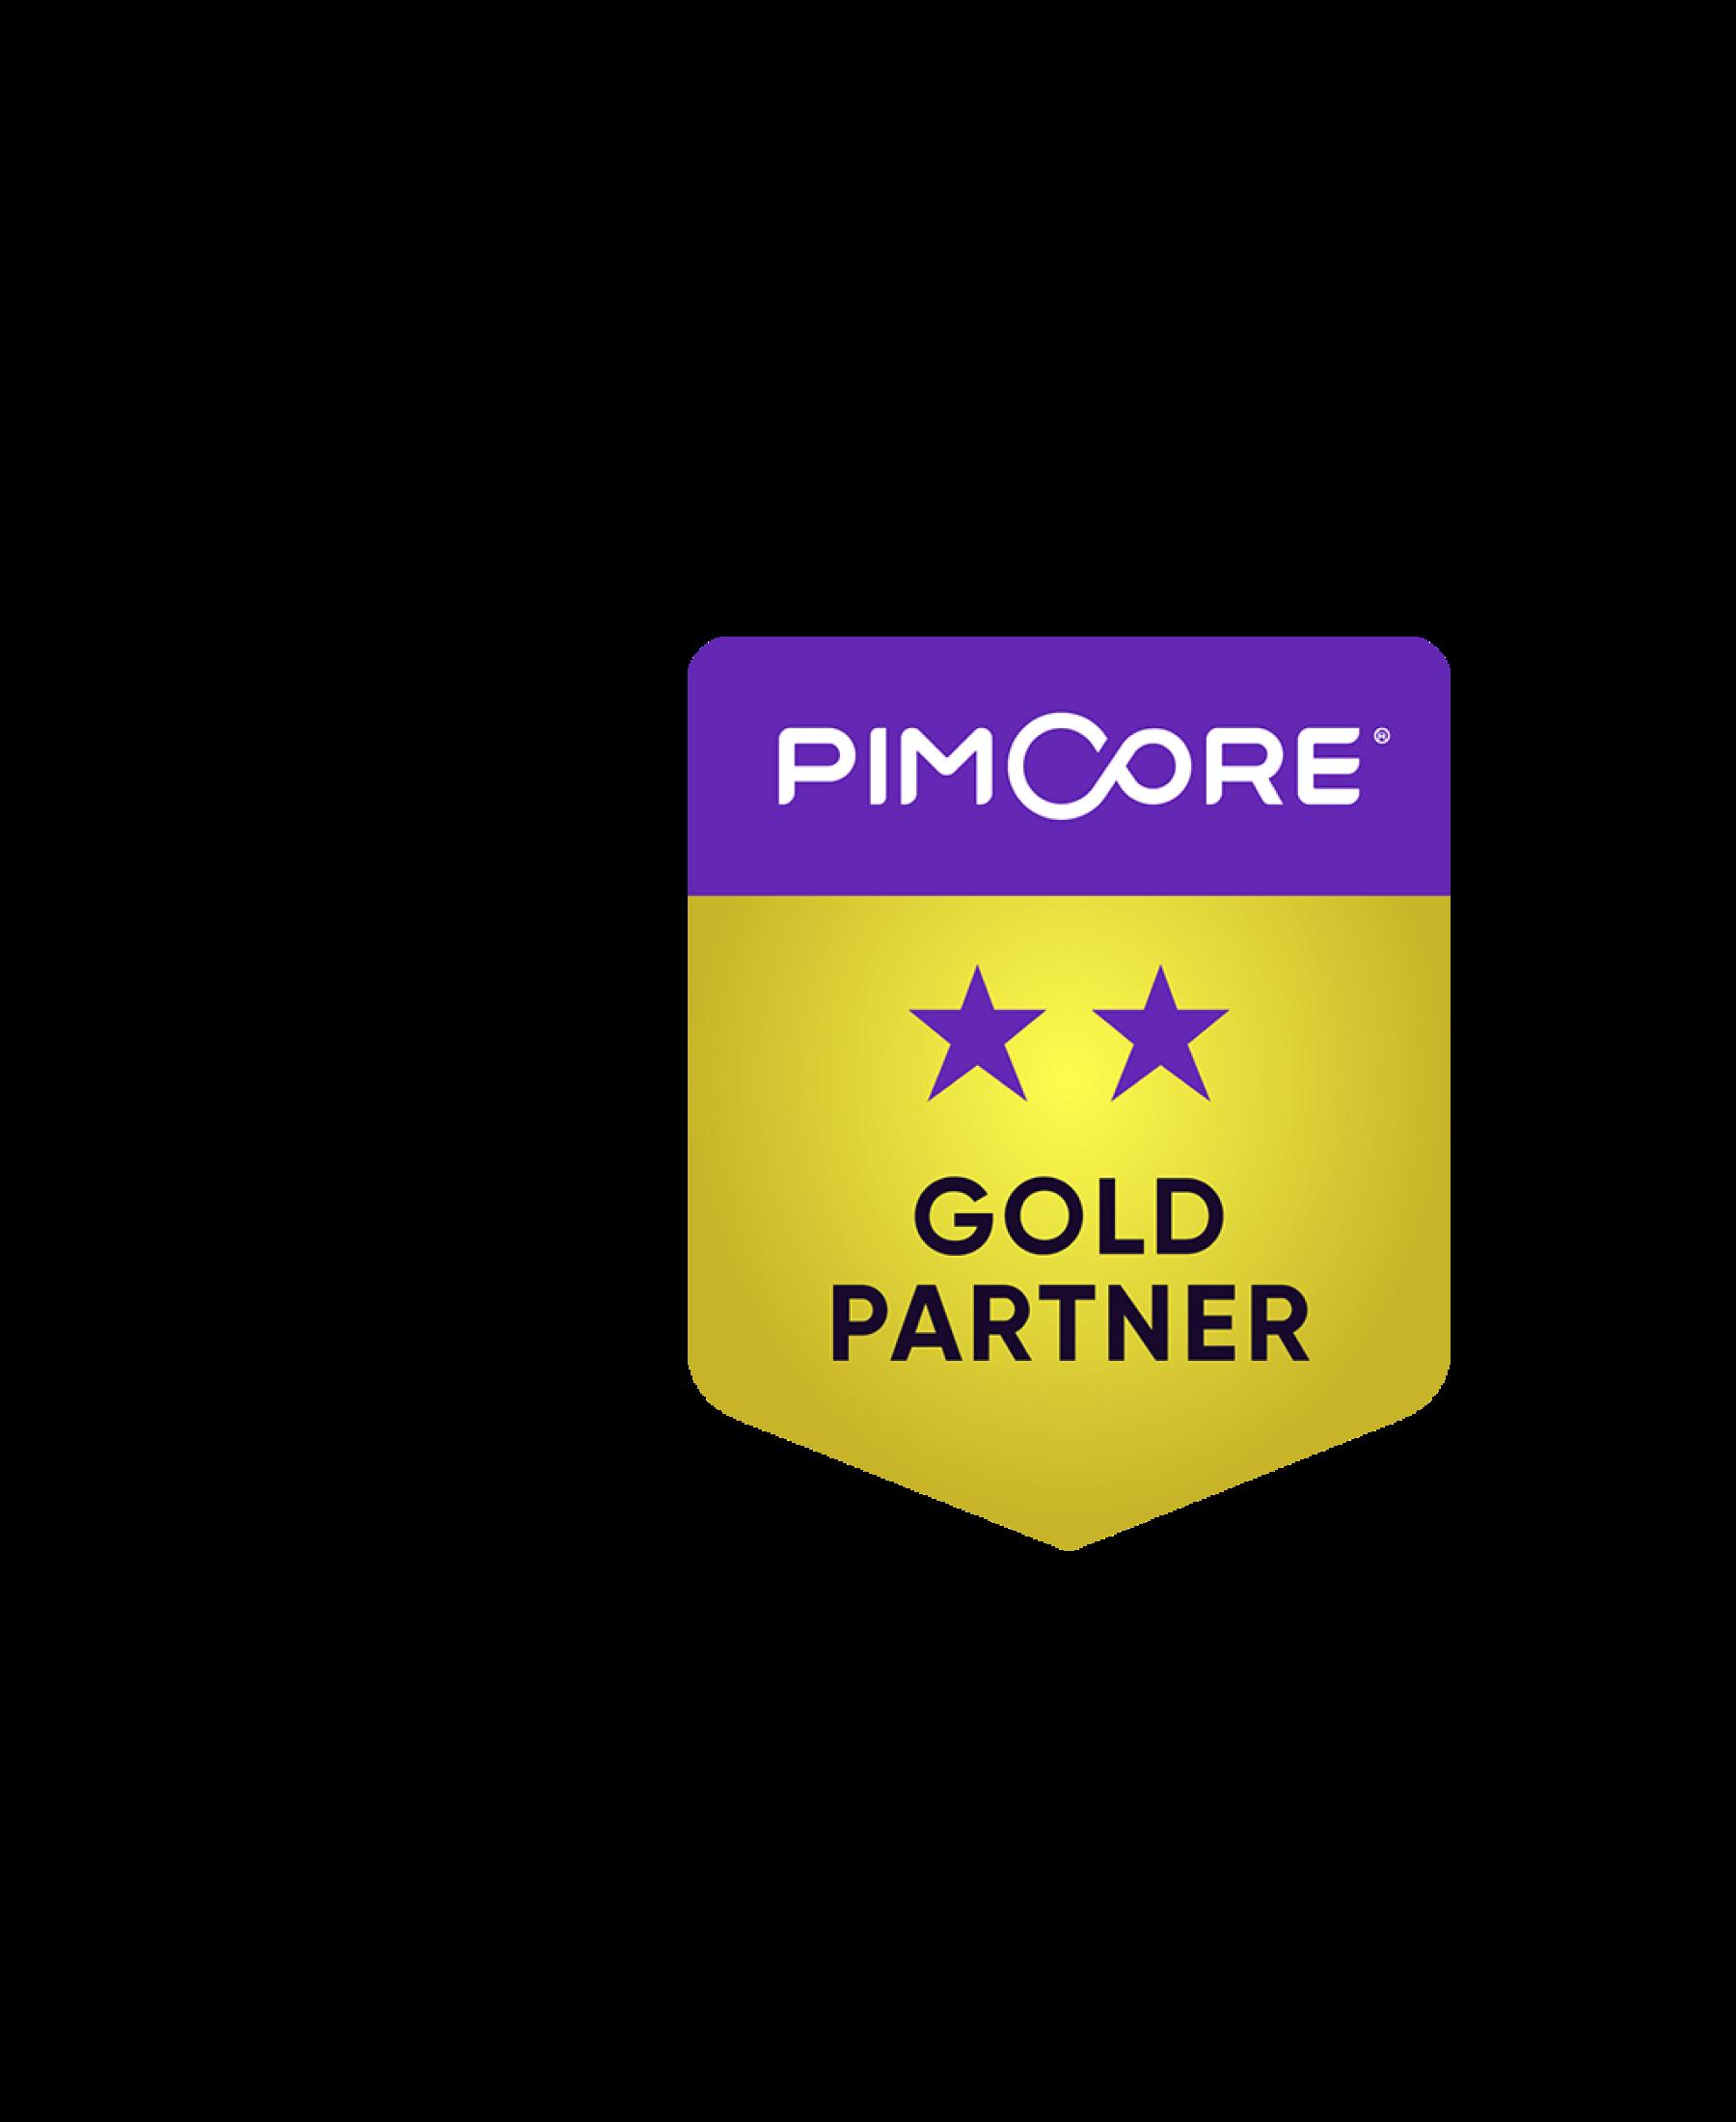 reaze ist Goldpartner bei Pimcore